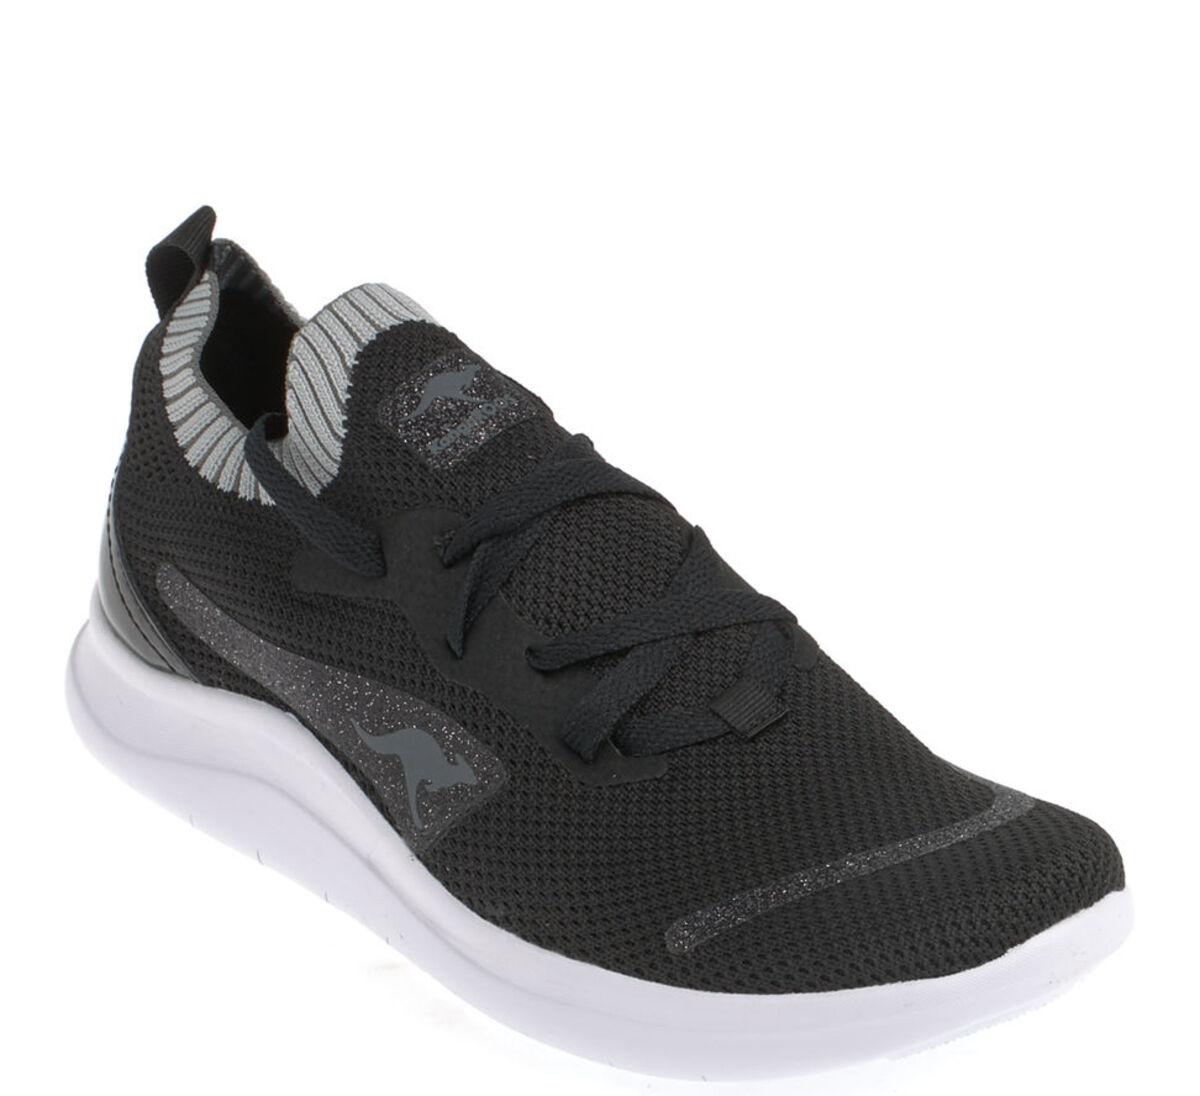 Bild 1 von Kangaroos Sneaker - KG-LIMBER SII